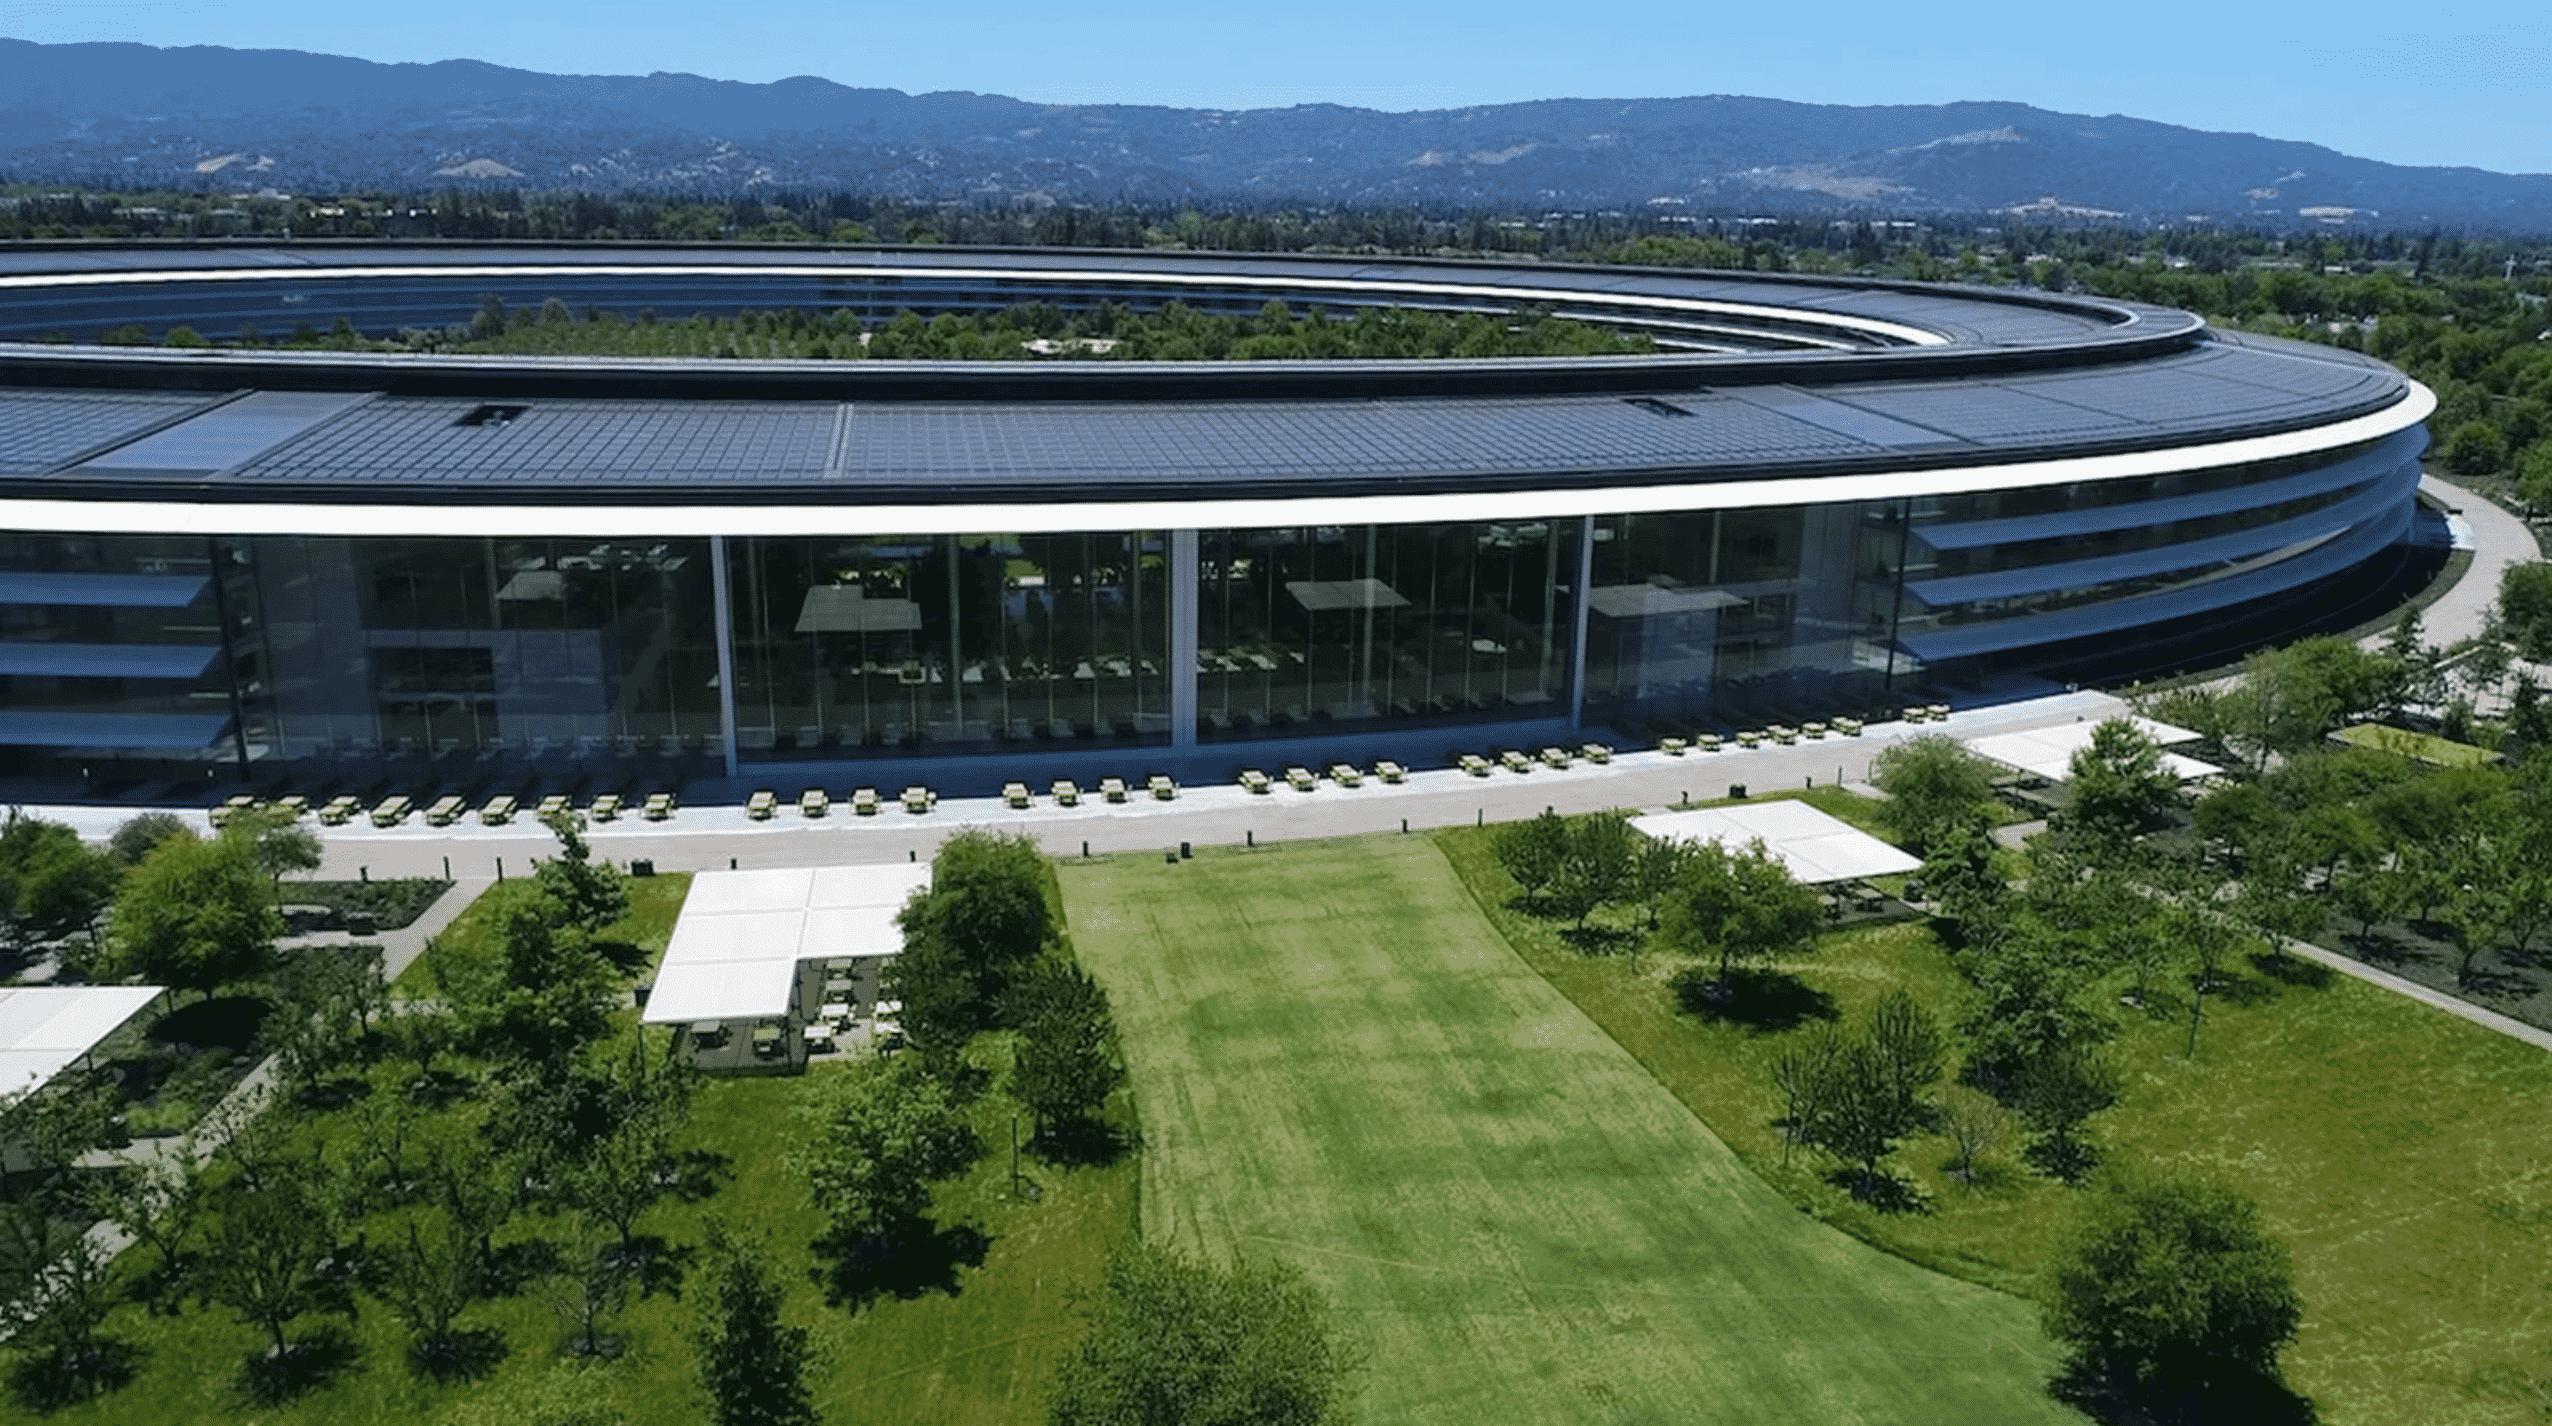 Apple postpones March event due to Coronavirus outbreak